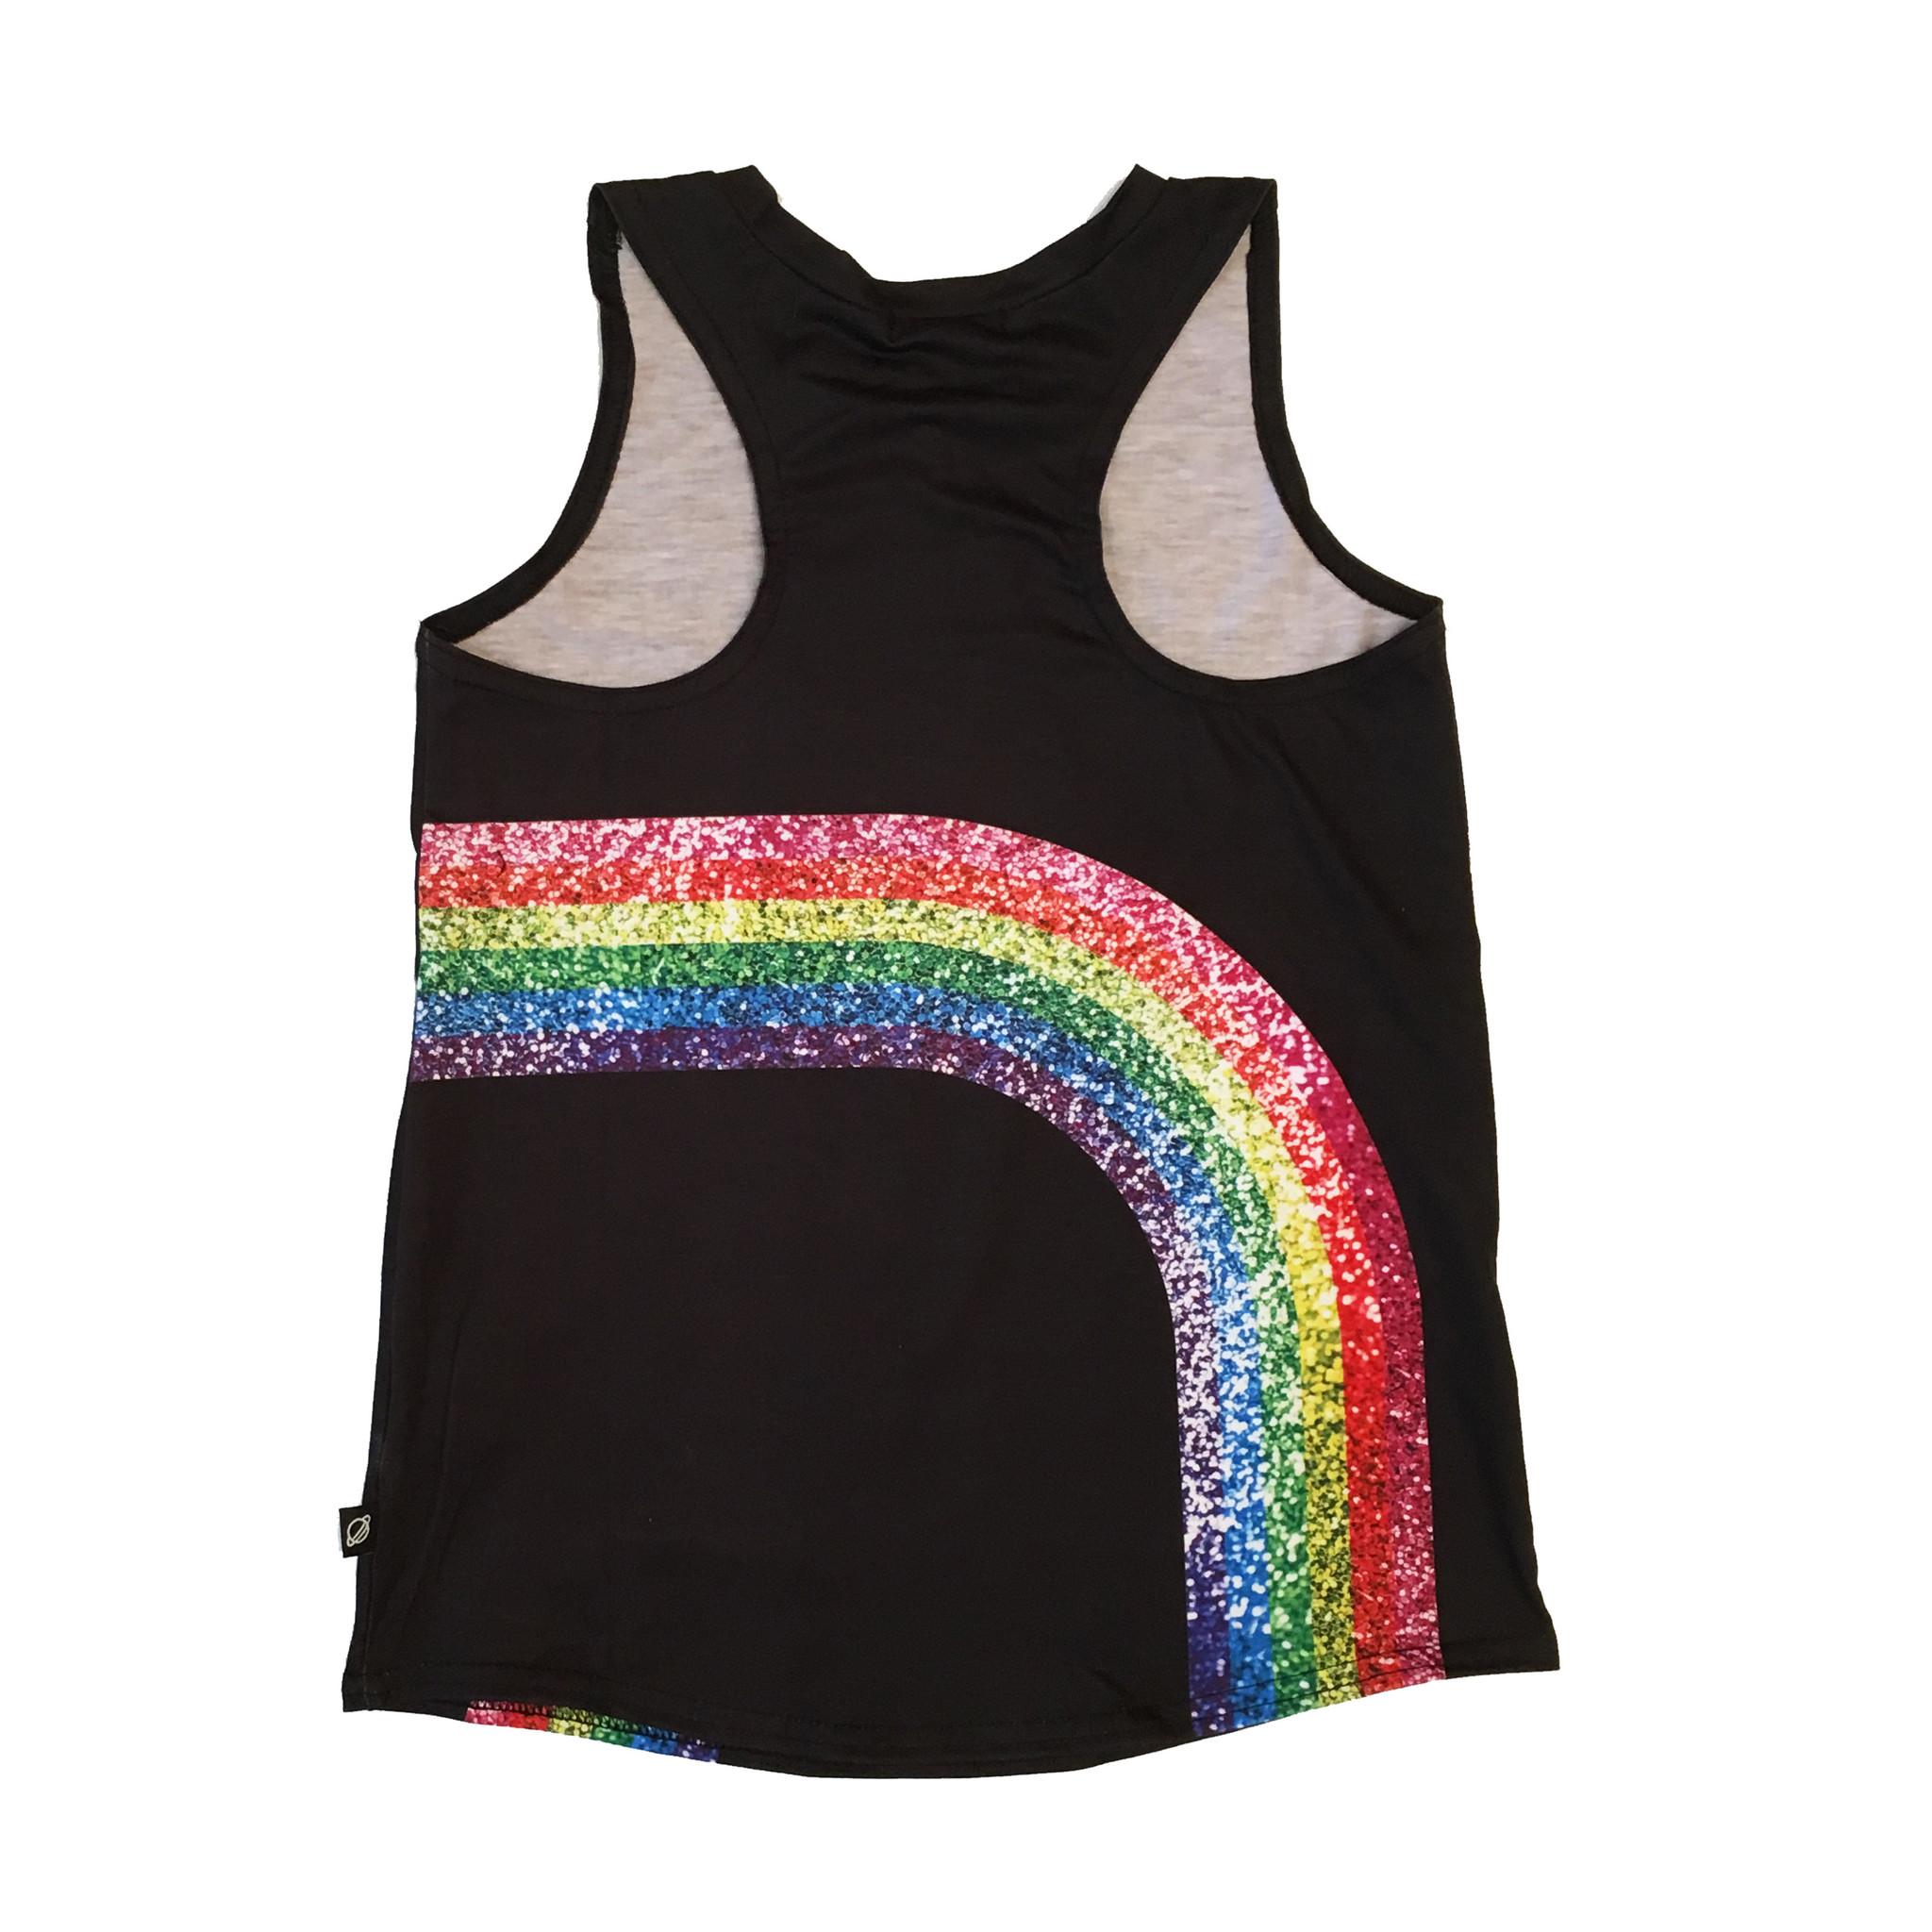 Terez Sparkly Rainbow Muscle Tank